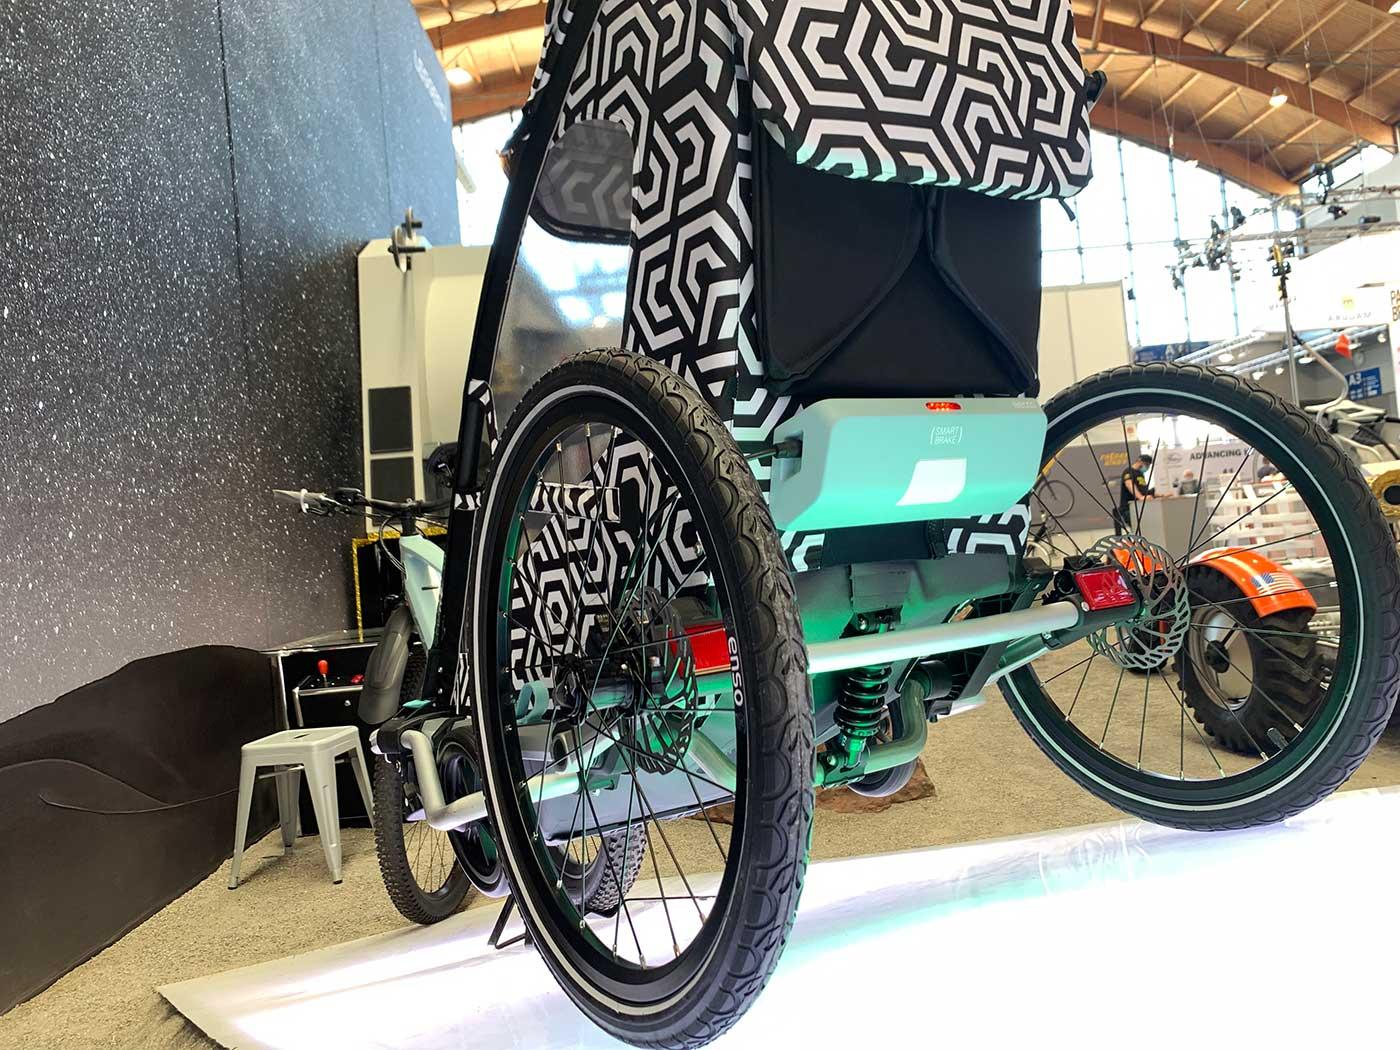 leggero overrun automatic braking prototype for kids bicycle trailers